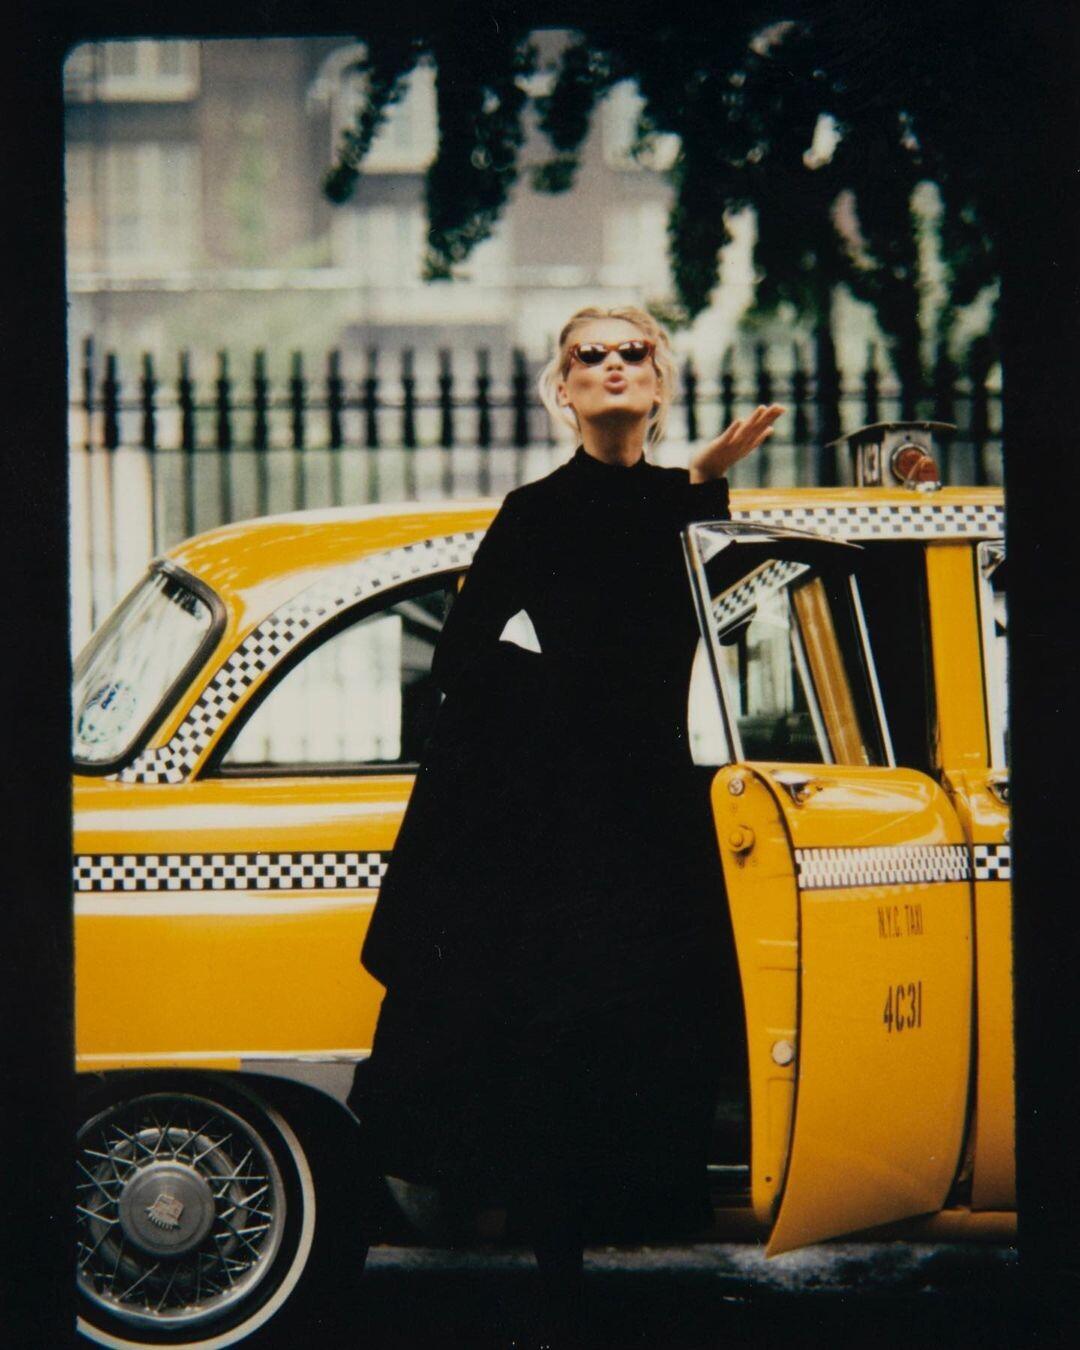 Даниэла Пештова, Нью-Йорк, 1992. Фотограф Марко Главиано